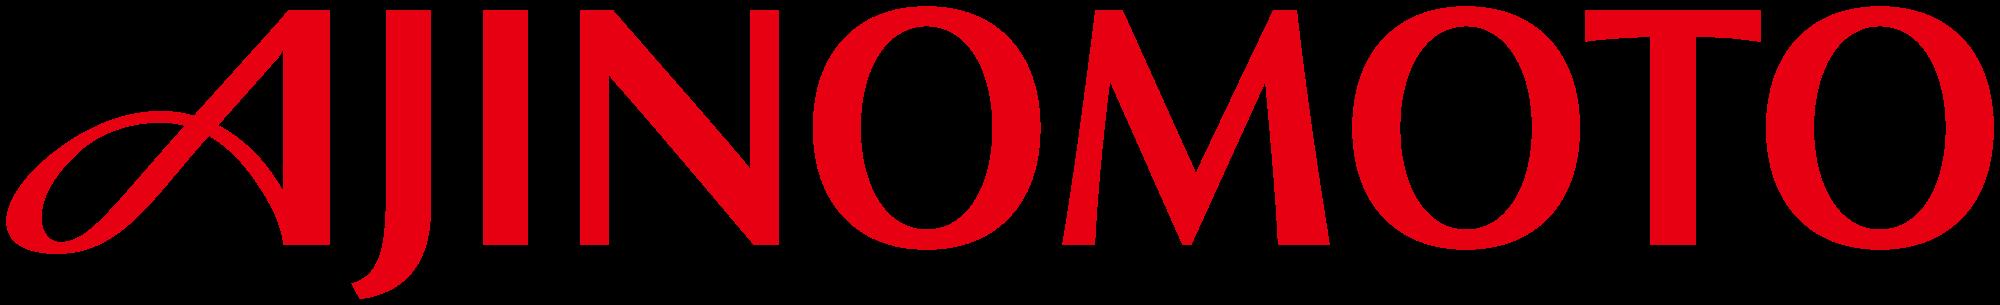 Open PlusPng.com  - Ajinomoto Logo PNG